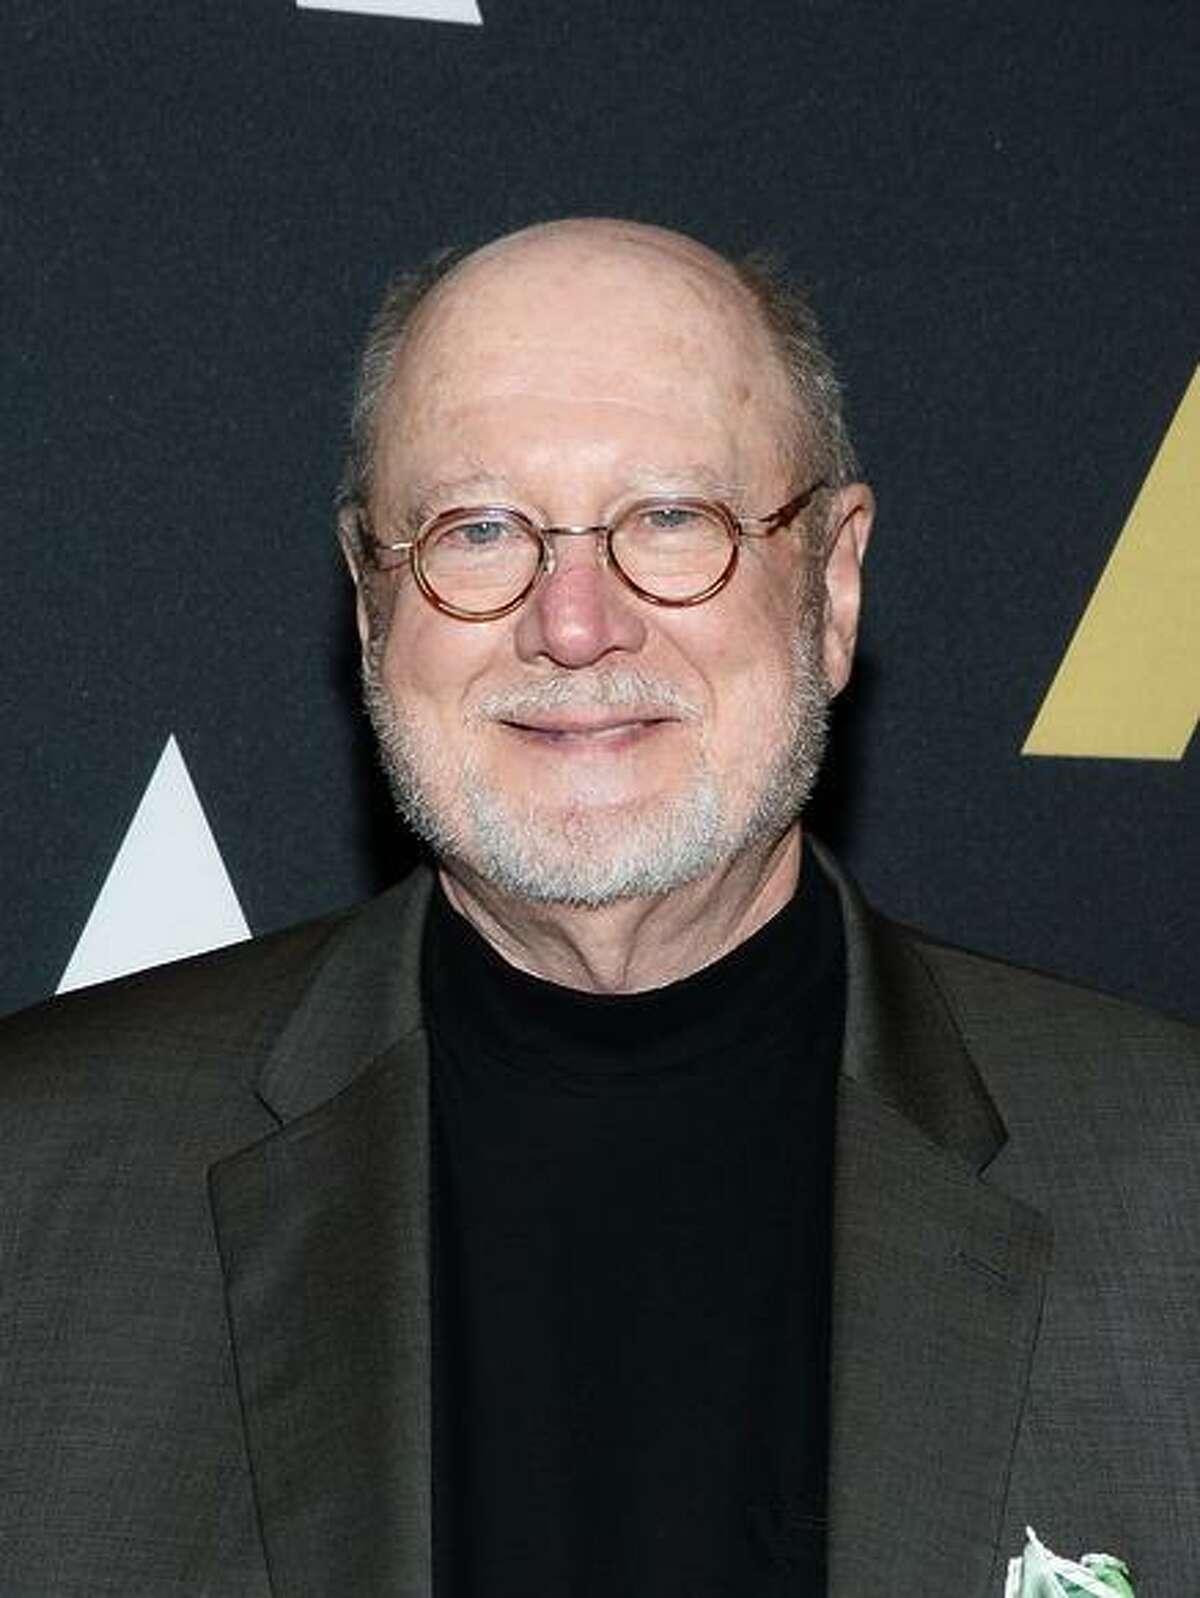 David Ogden Stiers appeared in several Woody Allen films.